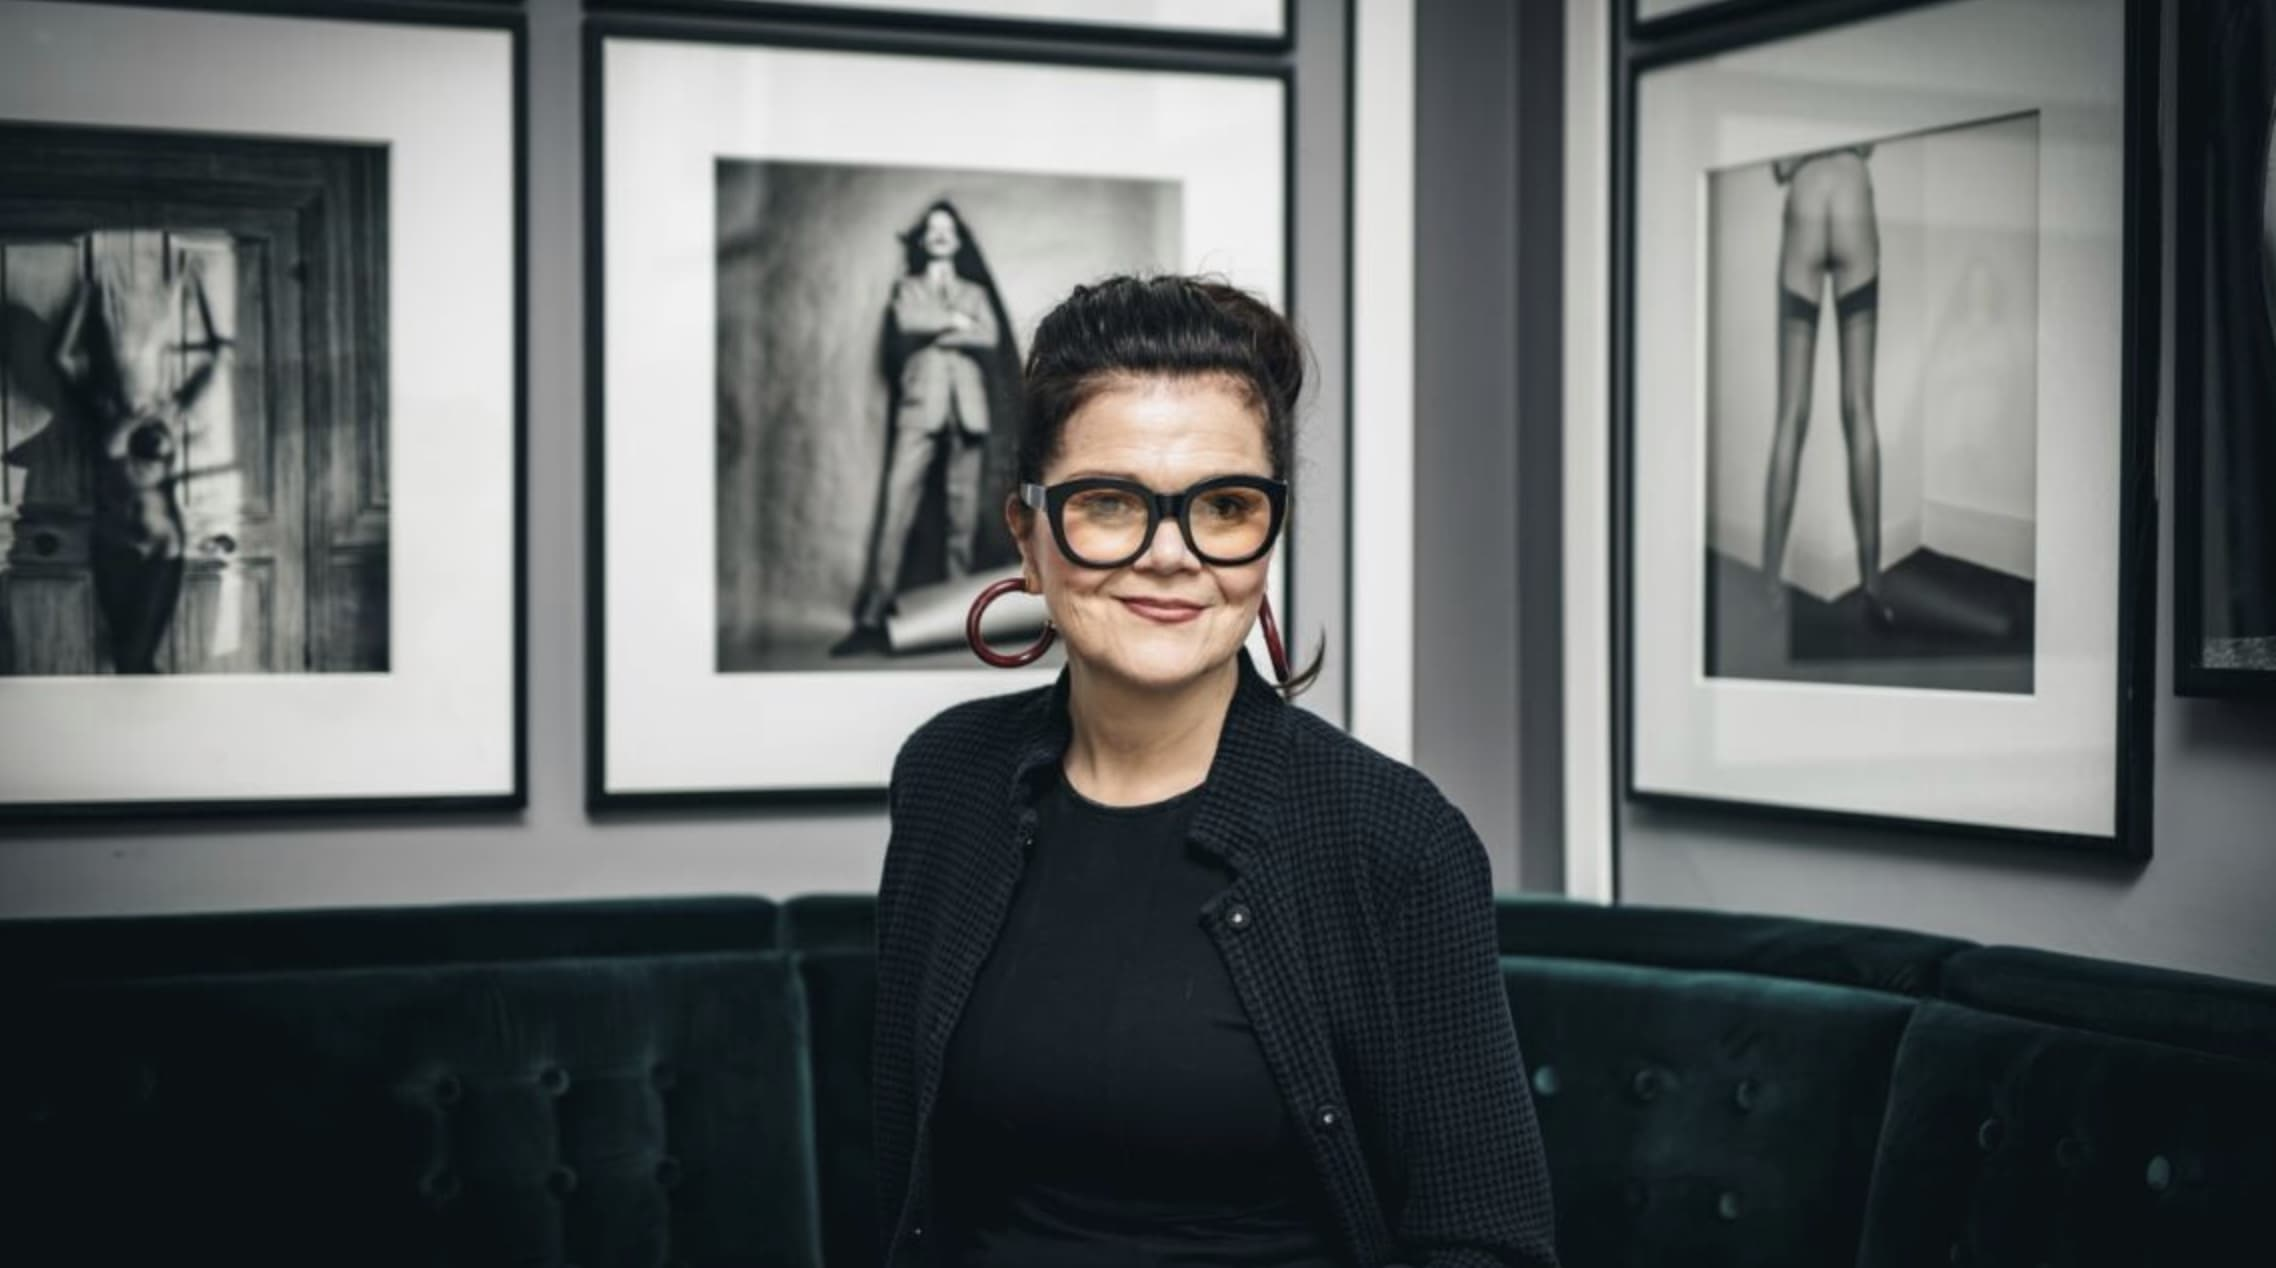 Maeve Doyle: My Life in Art